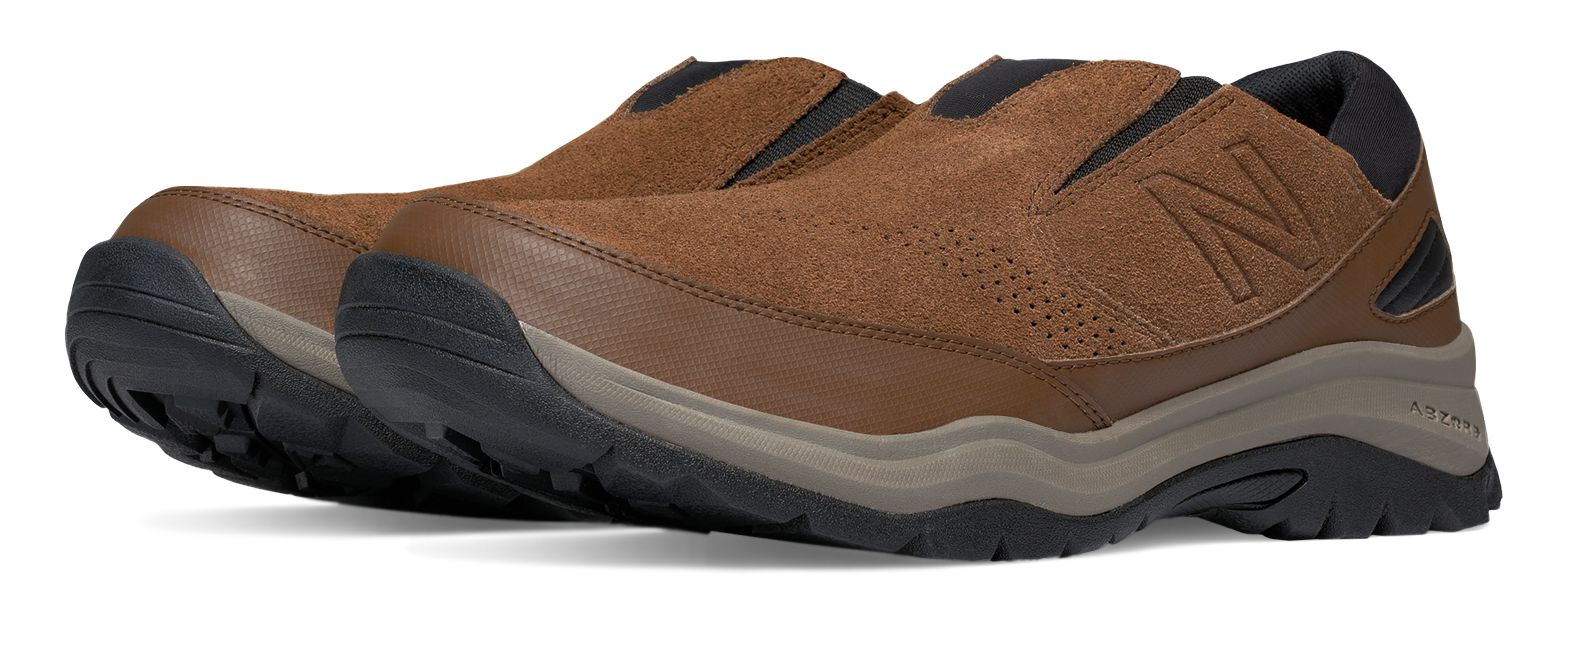 Discount Men\\u0027s New Balance Walking Shoes | Joe\\u0027s Official New  Balance Outlet